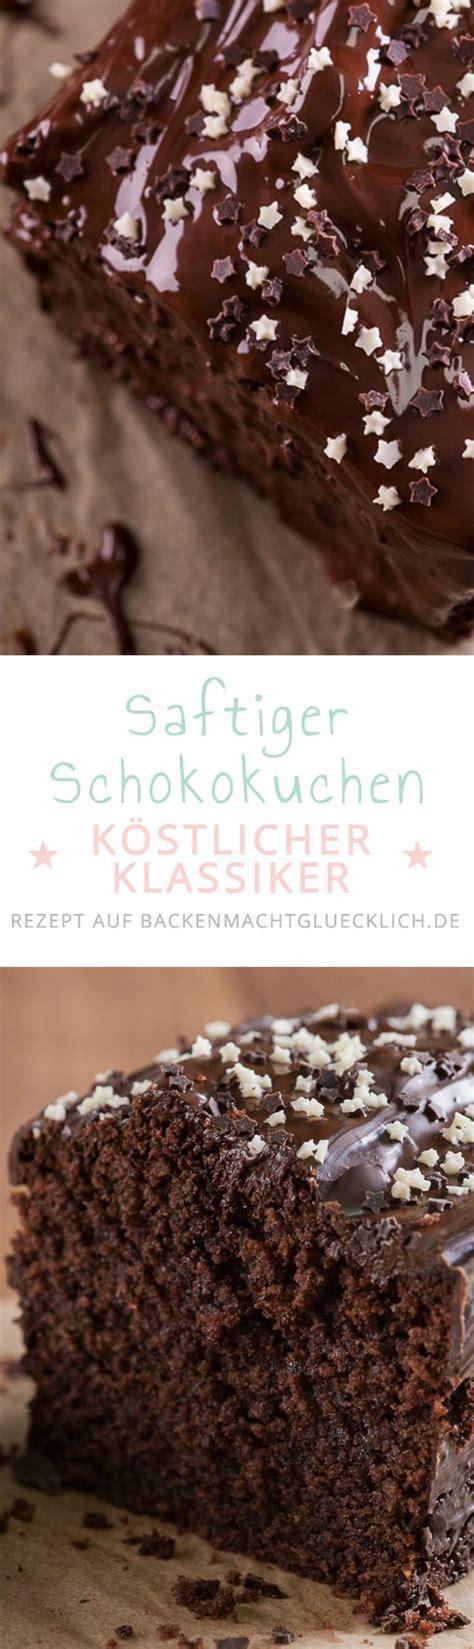 kuchen feucht 25 best ideas about schokolade on backen